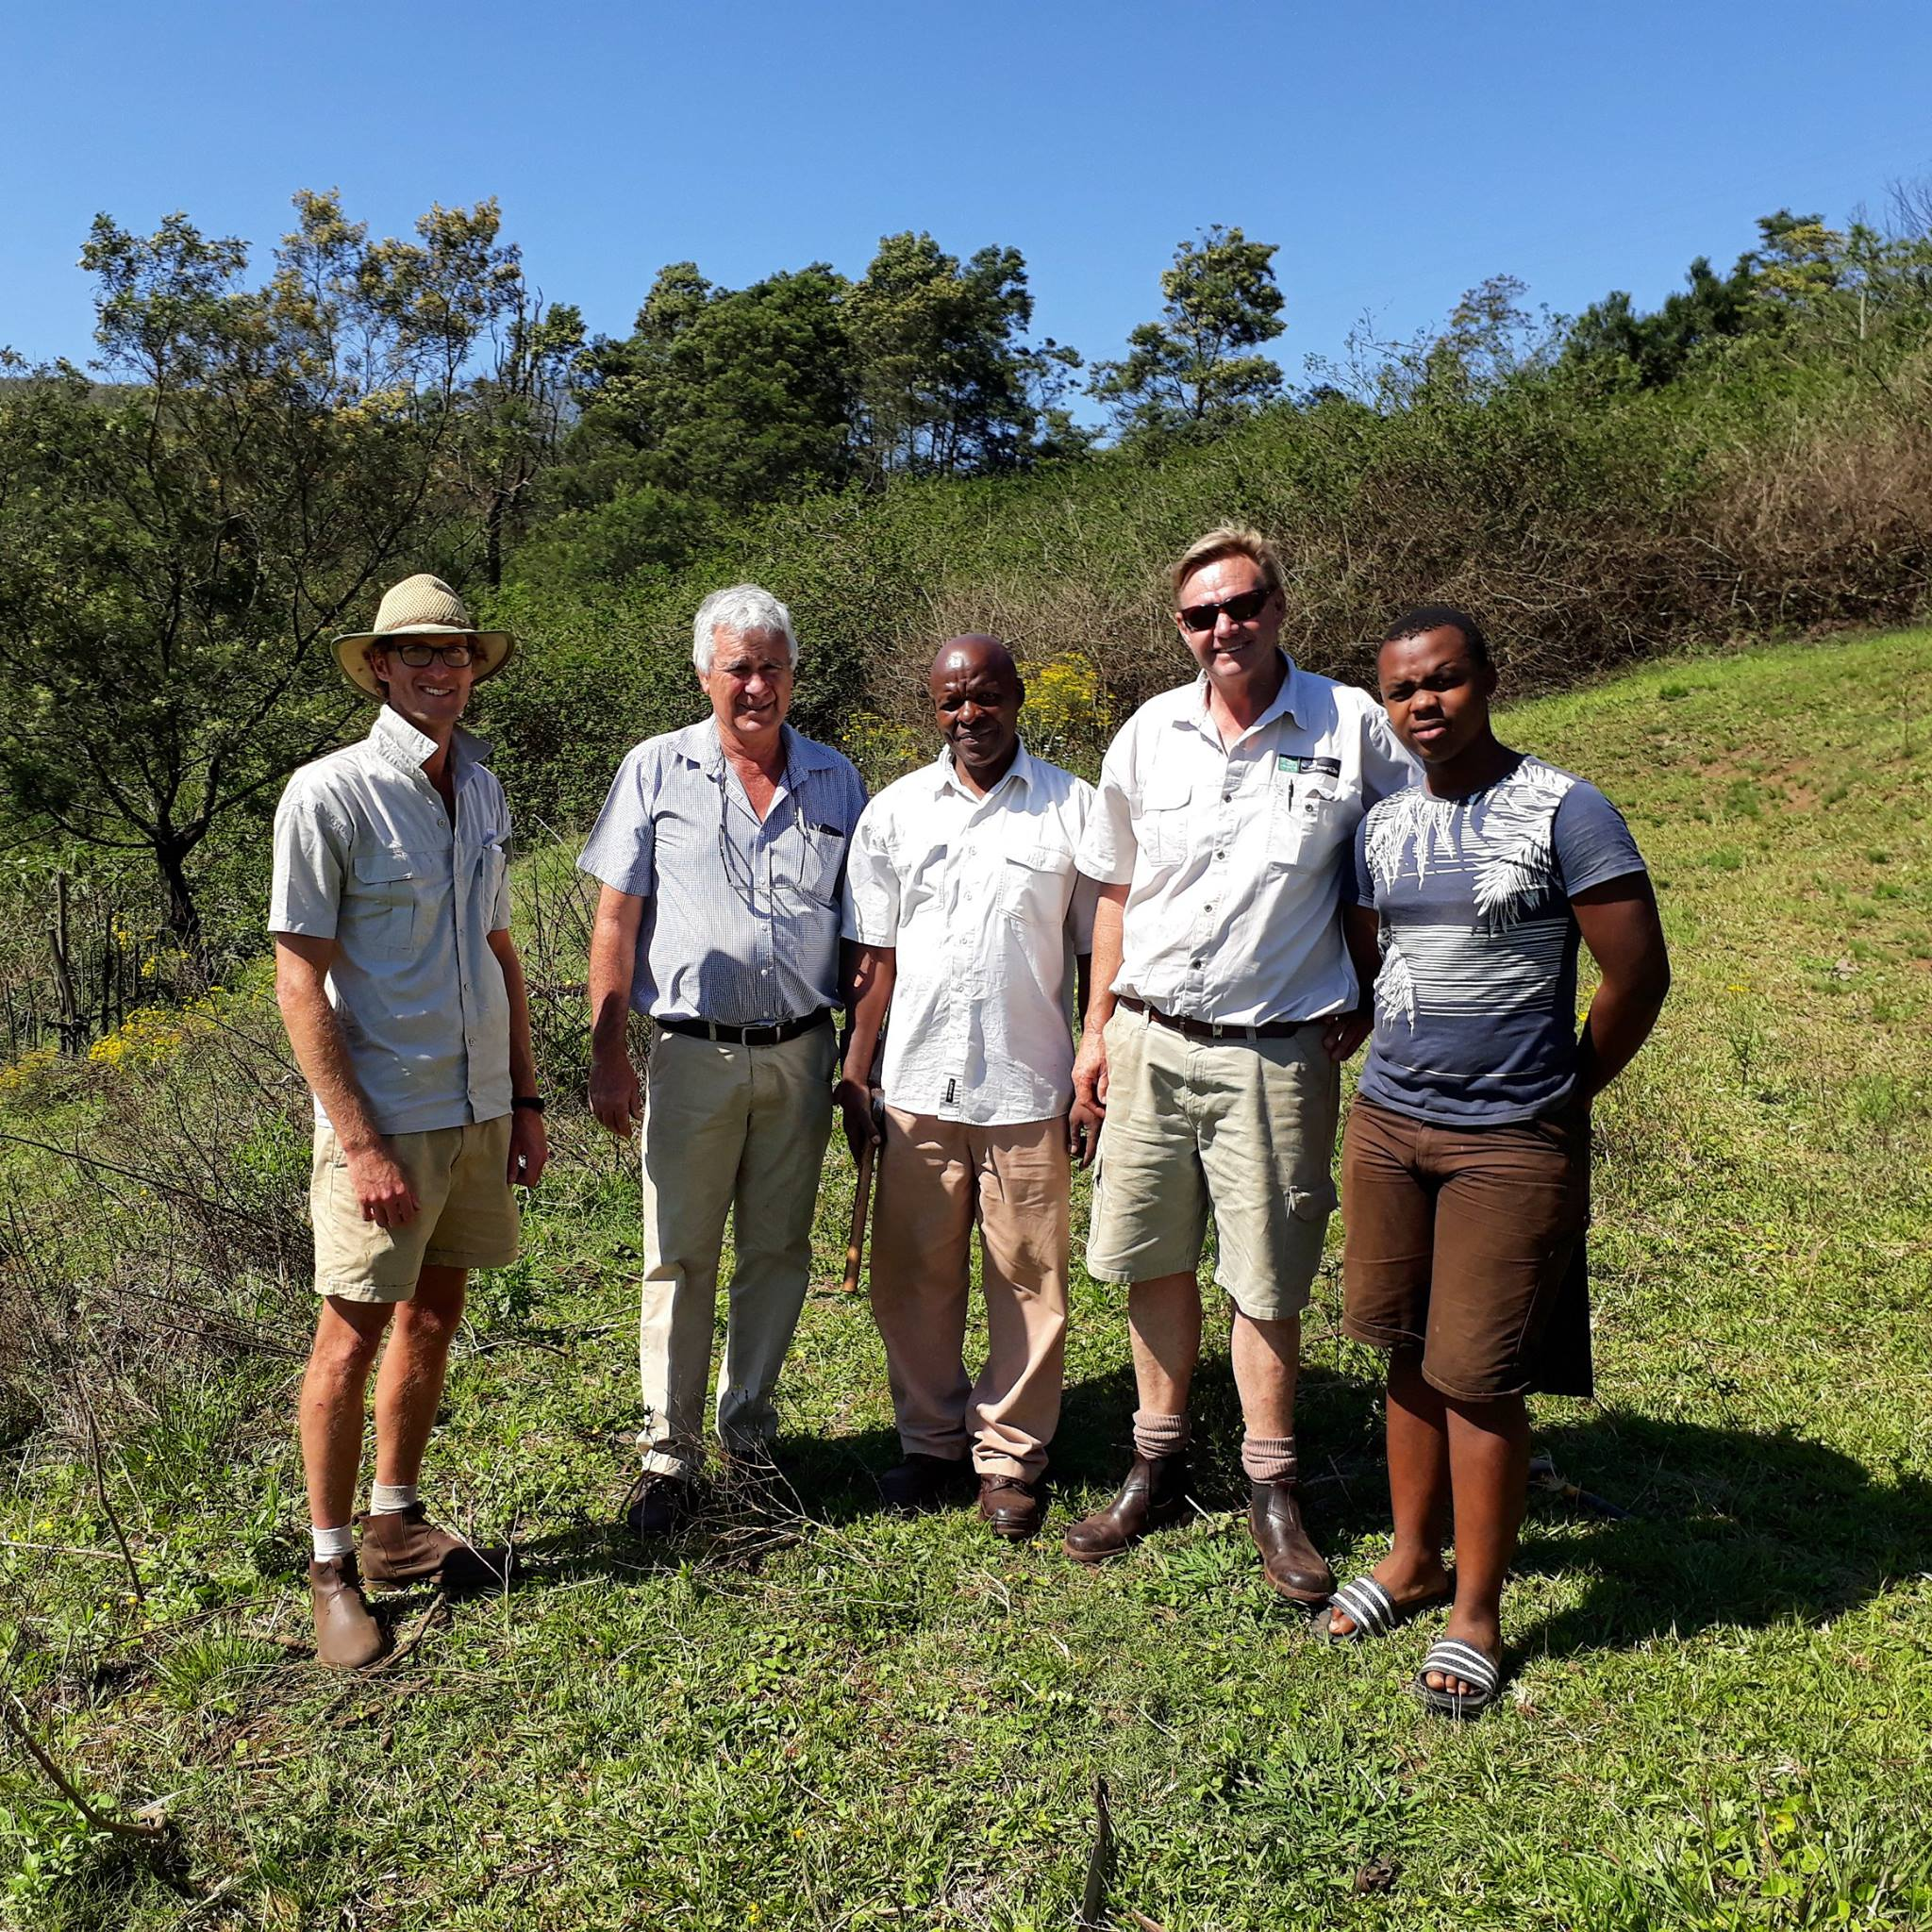 From left to right: Andrew Pooler, Dave Van Rensburg, Cyril Hlengwa, Rob Stapylton-Smith, Cyril's grandson Siya — at Hlutankungu.